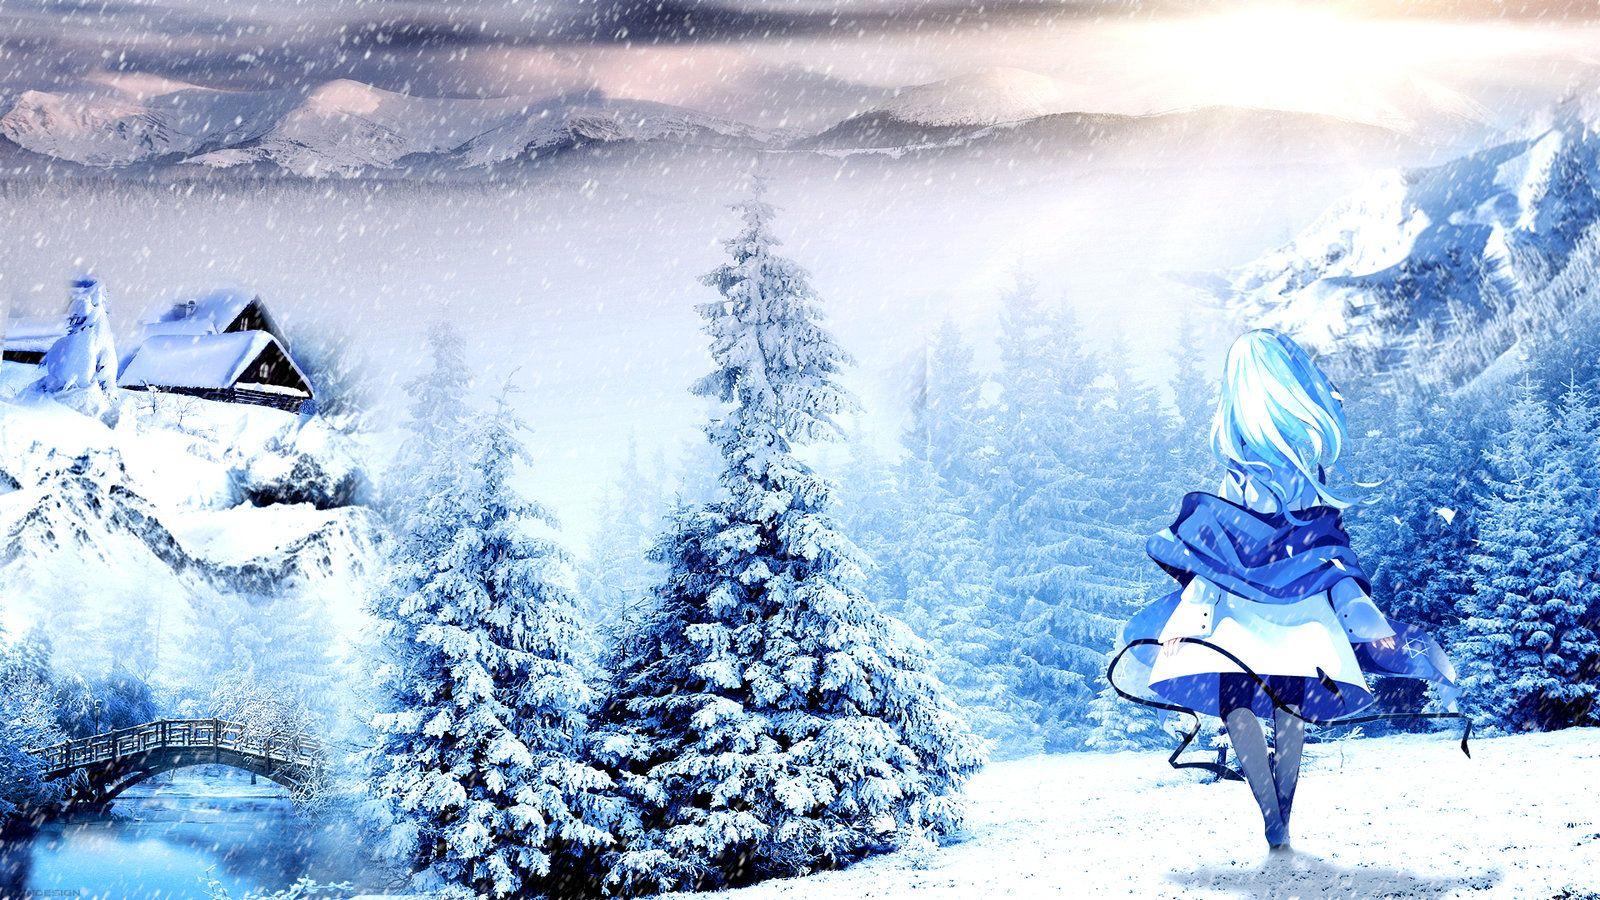 Anime Winter Wallpaper By Atndesign Winter Wallpaper Wallpaper Anime